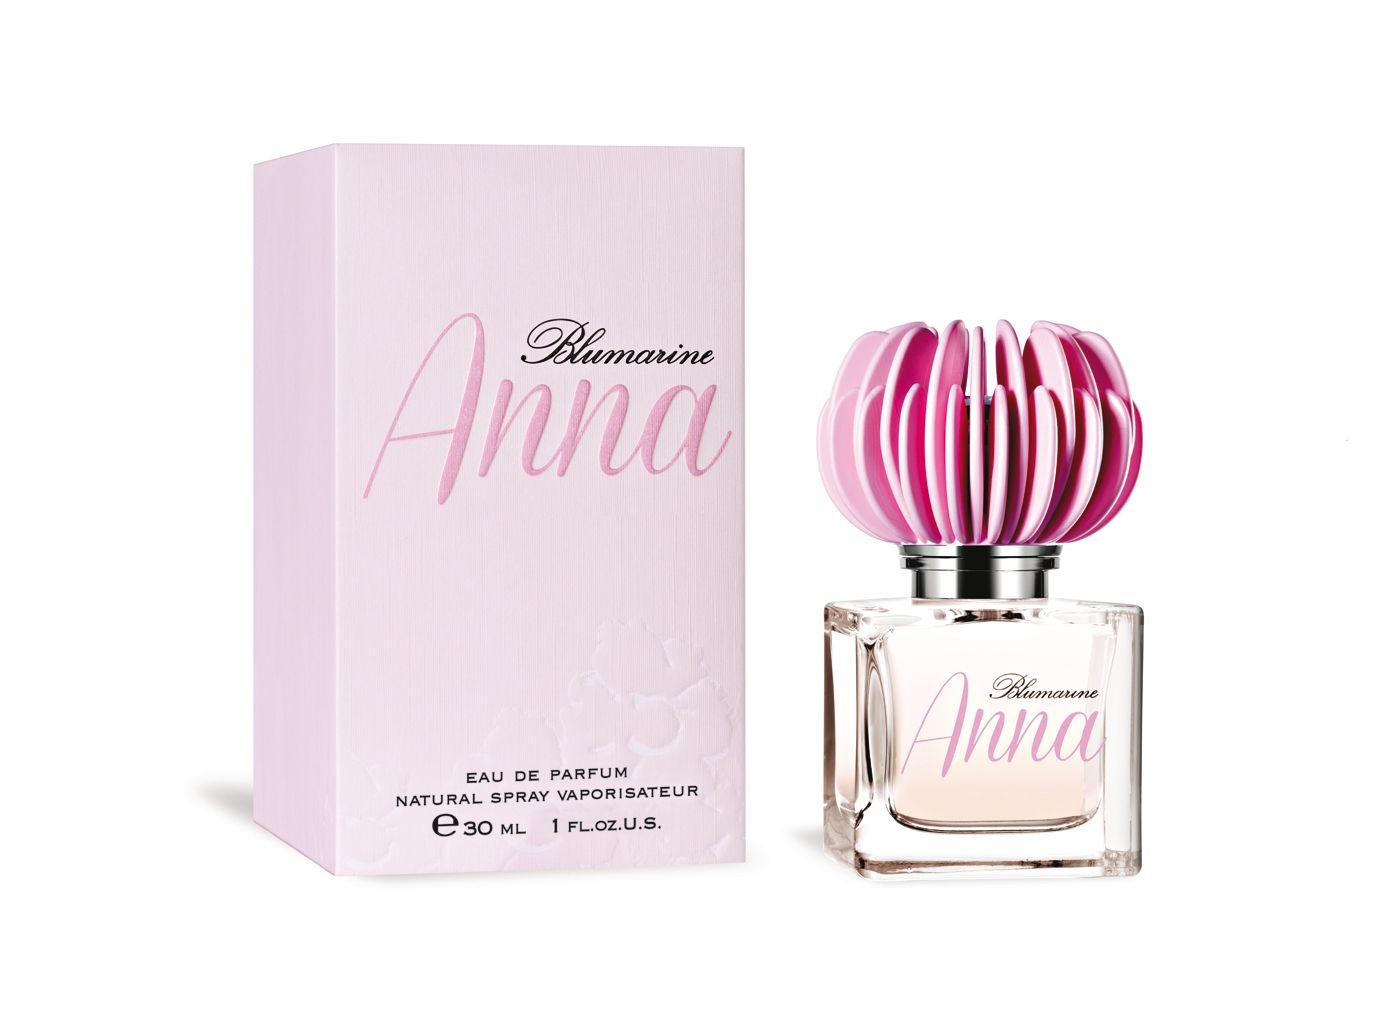 Blumarine E Shop Blumarine E Shop | Perfume, Fragrance